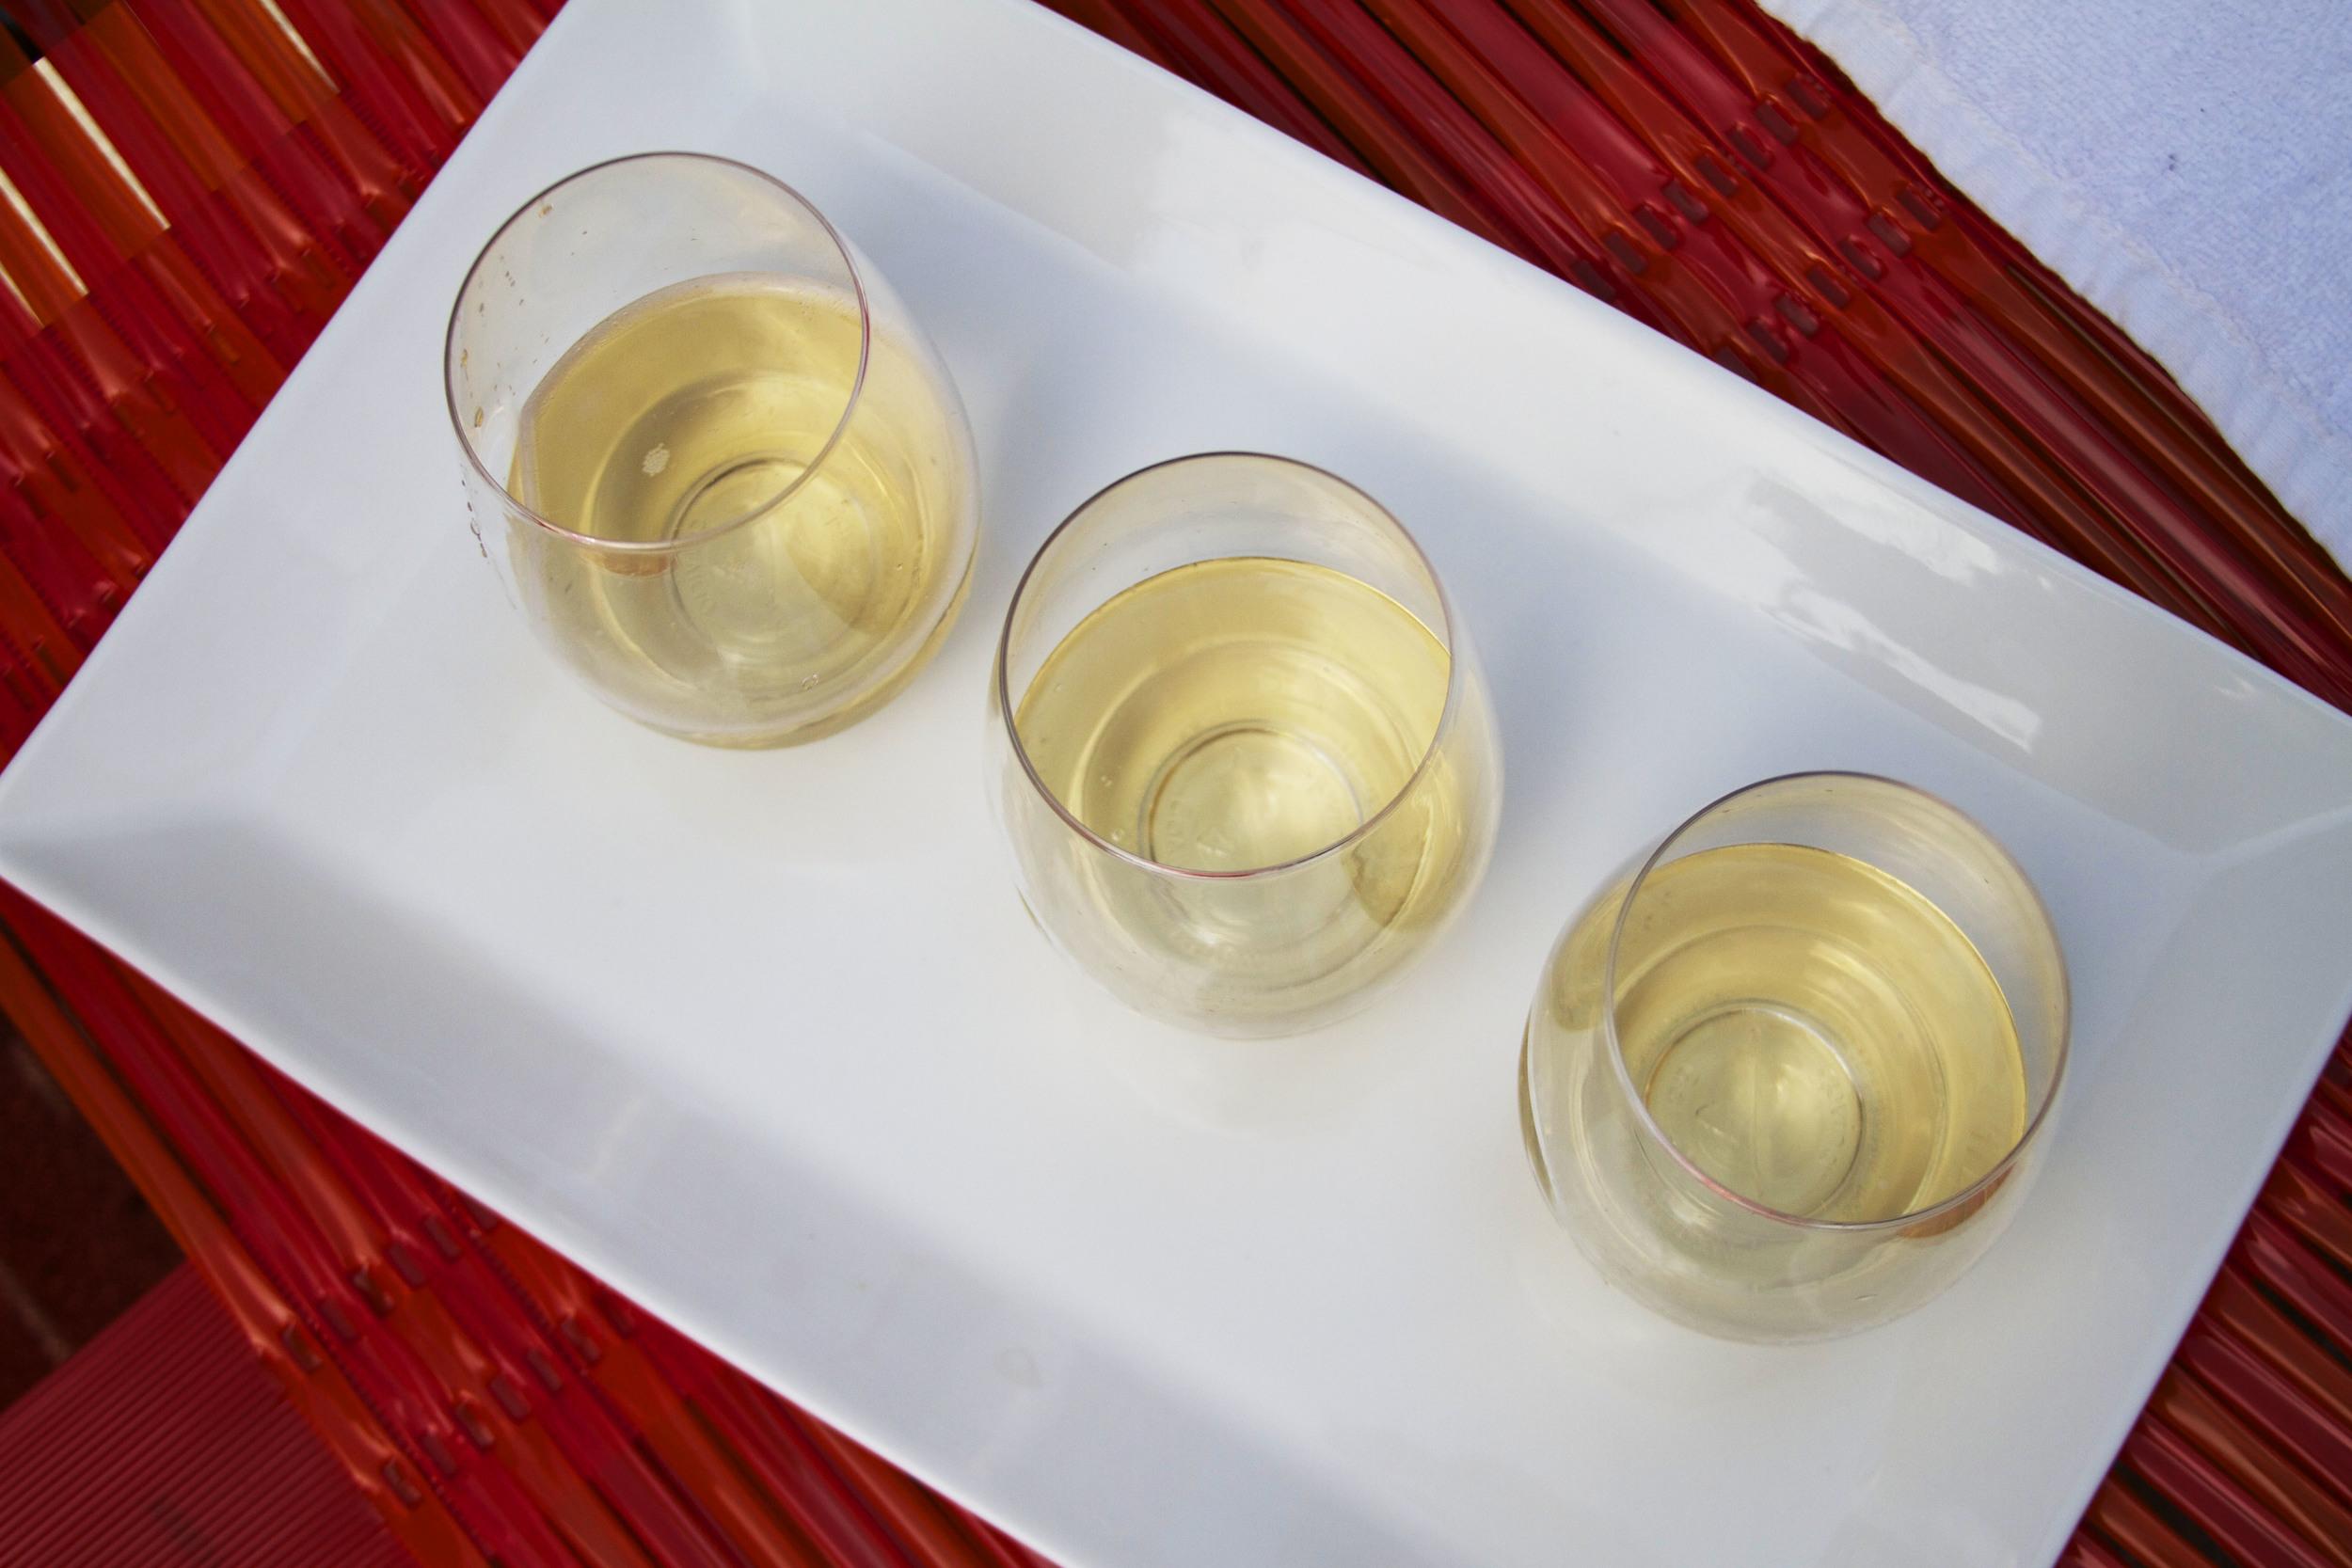 champ glass.jpg